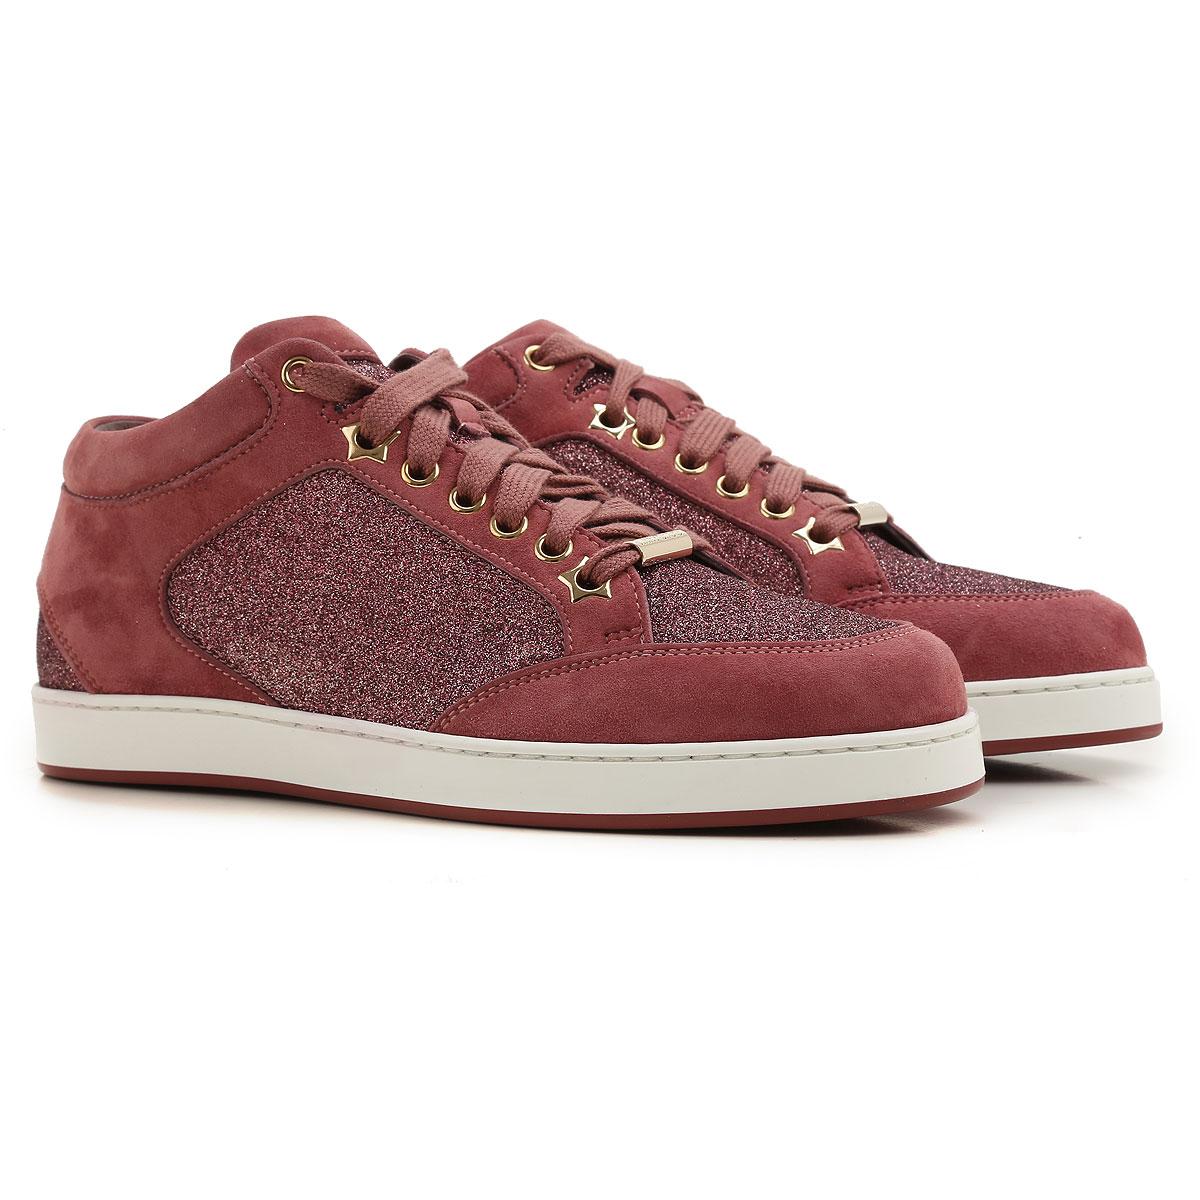 chaussures femme jimmy choo code produit miami fgs174 vintagerose. Black Bedroom Furniture Sets. Home Design Ideas